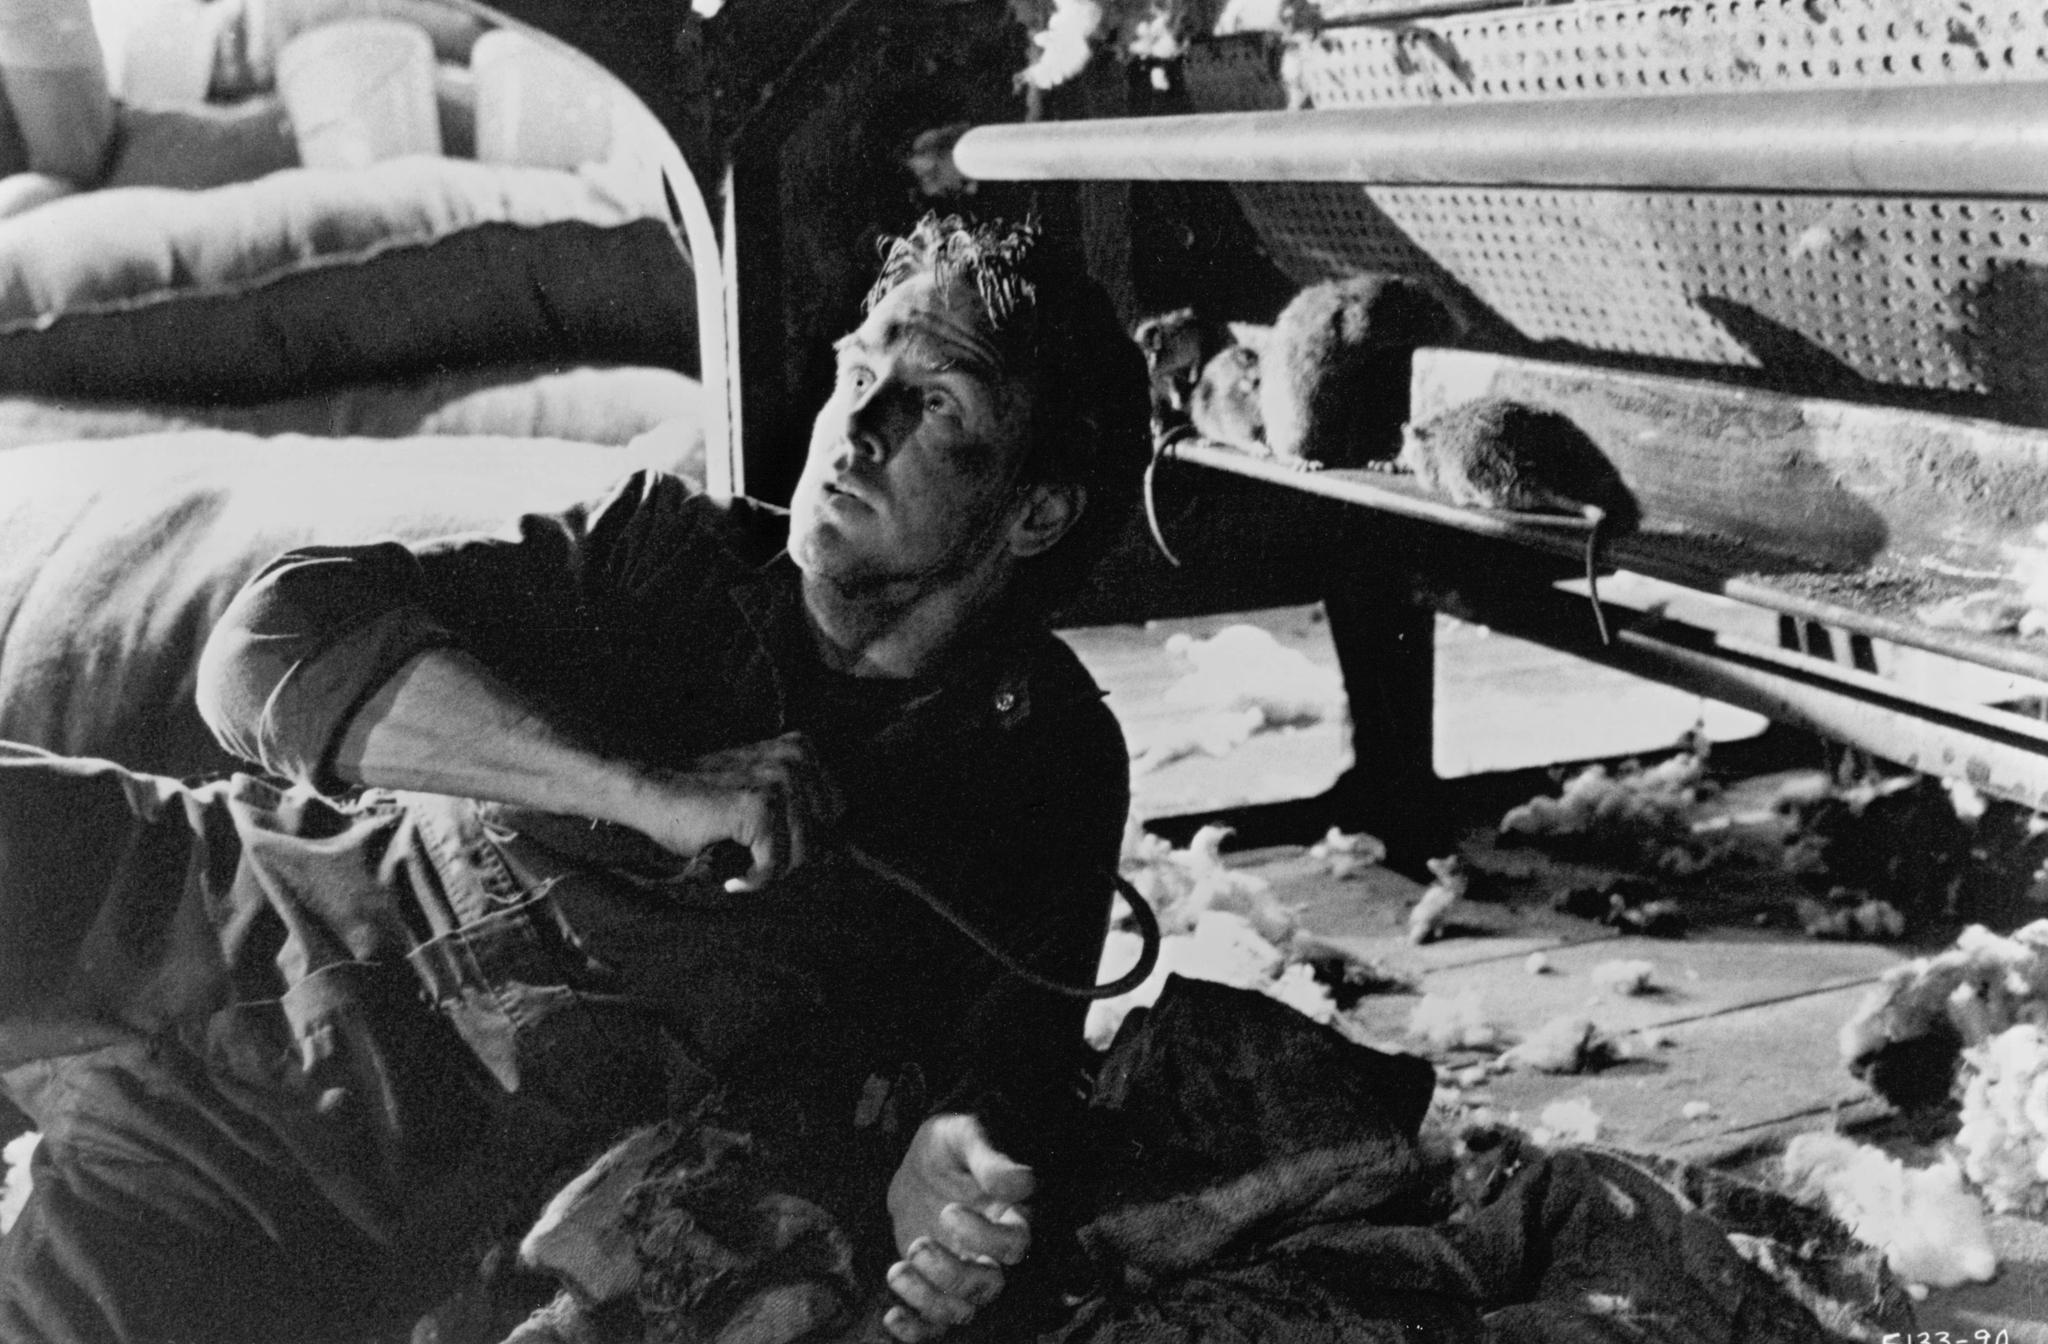 David Andrews in Graveyard Shift (1990)